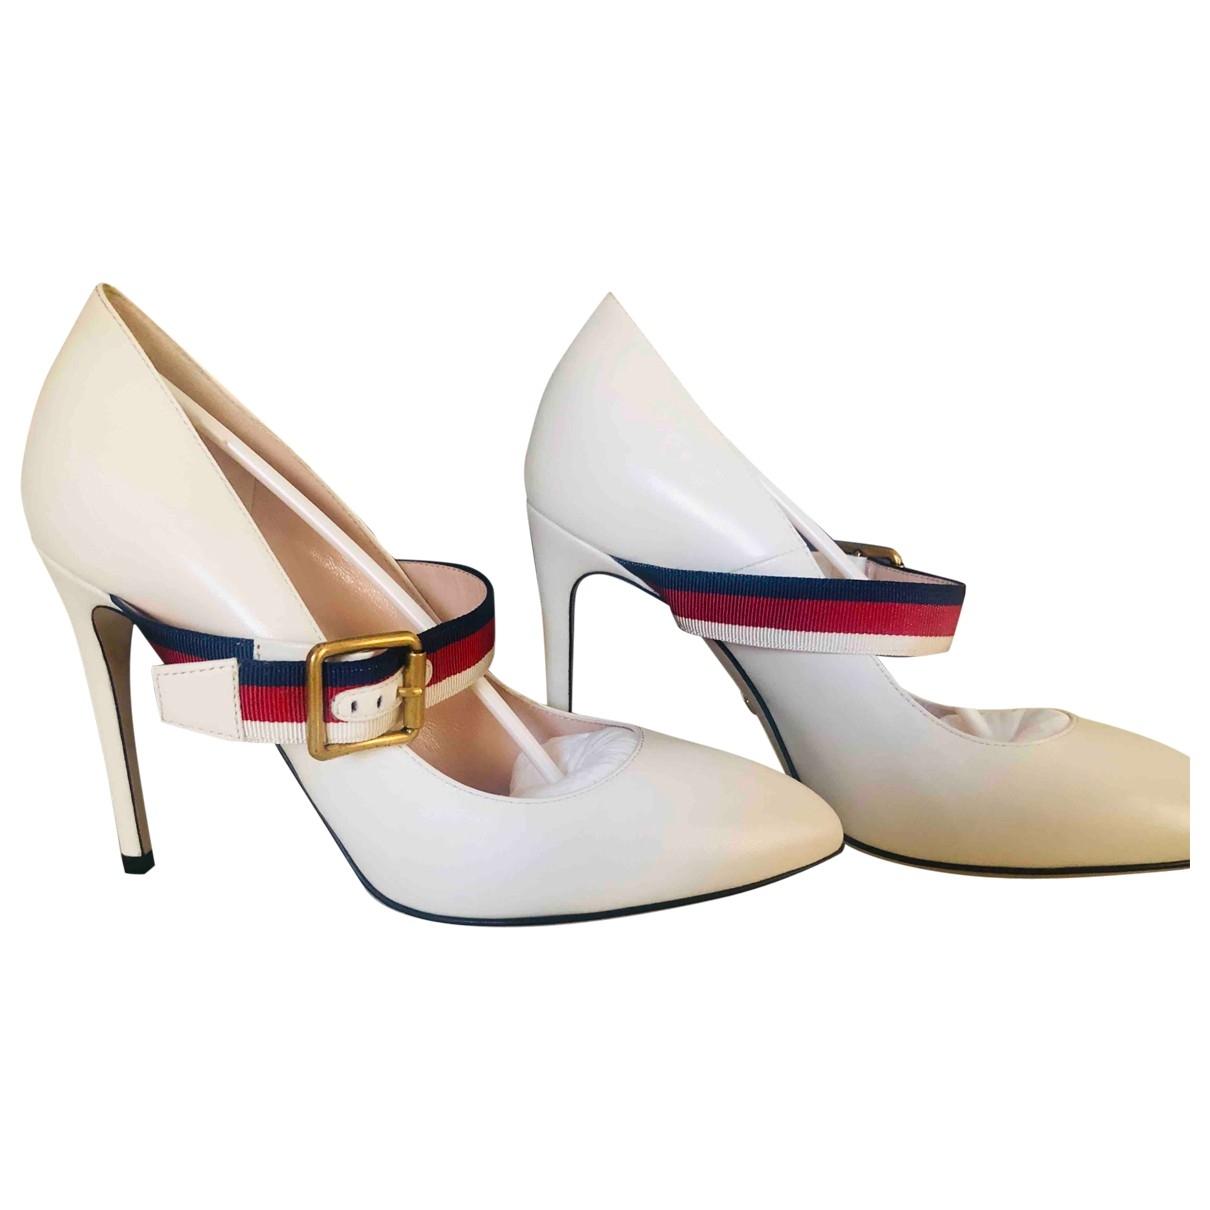 Gucci Sylvie Beige Leather Heels for Women 36.5 EU